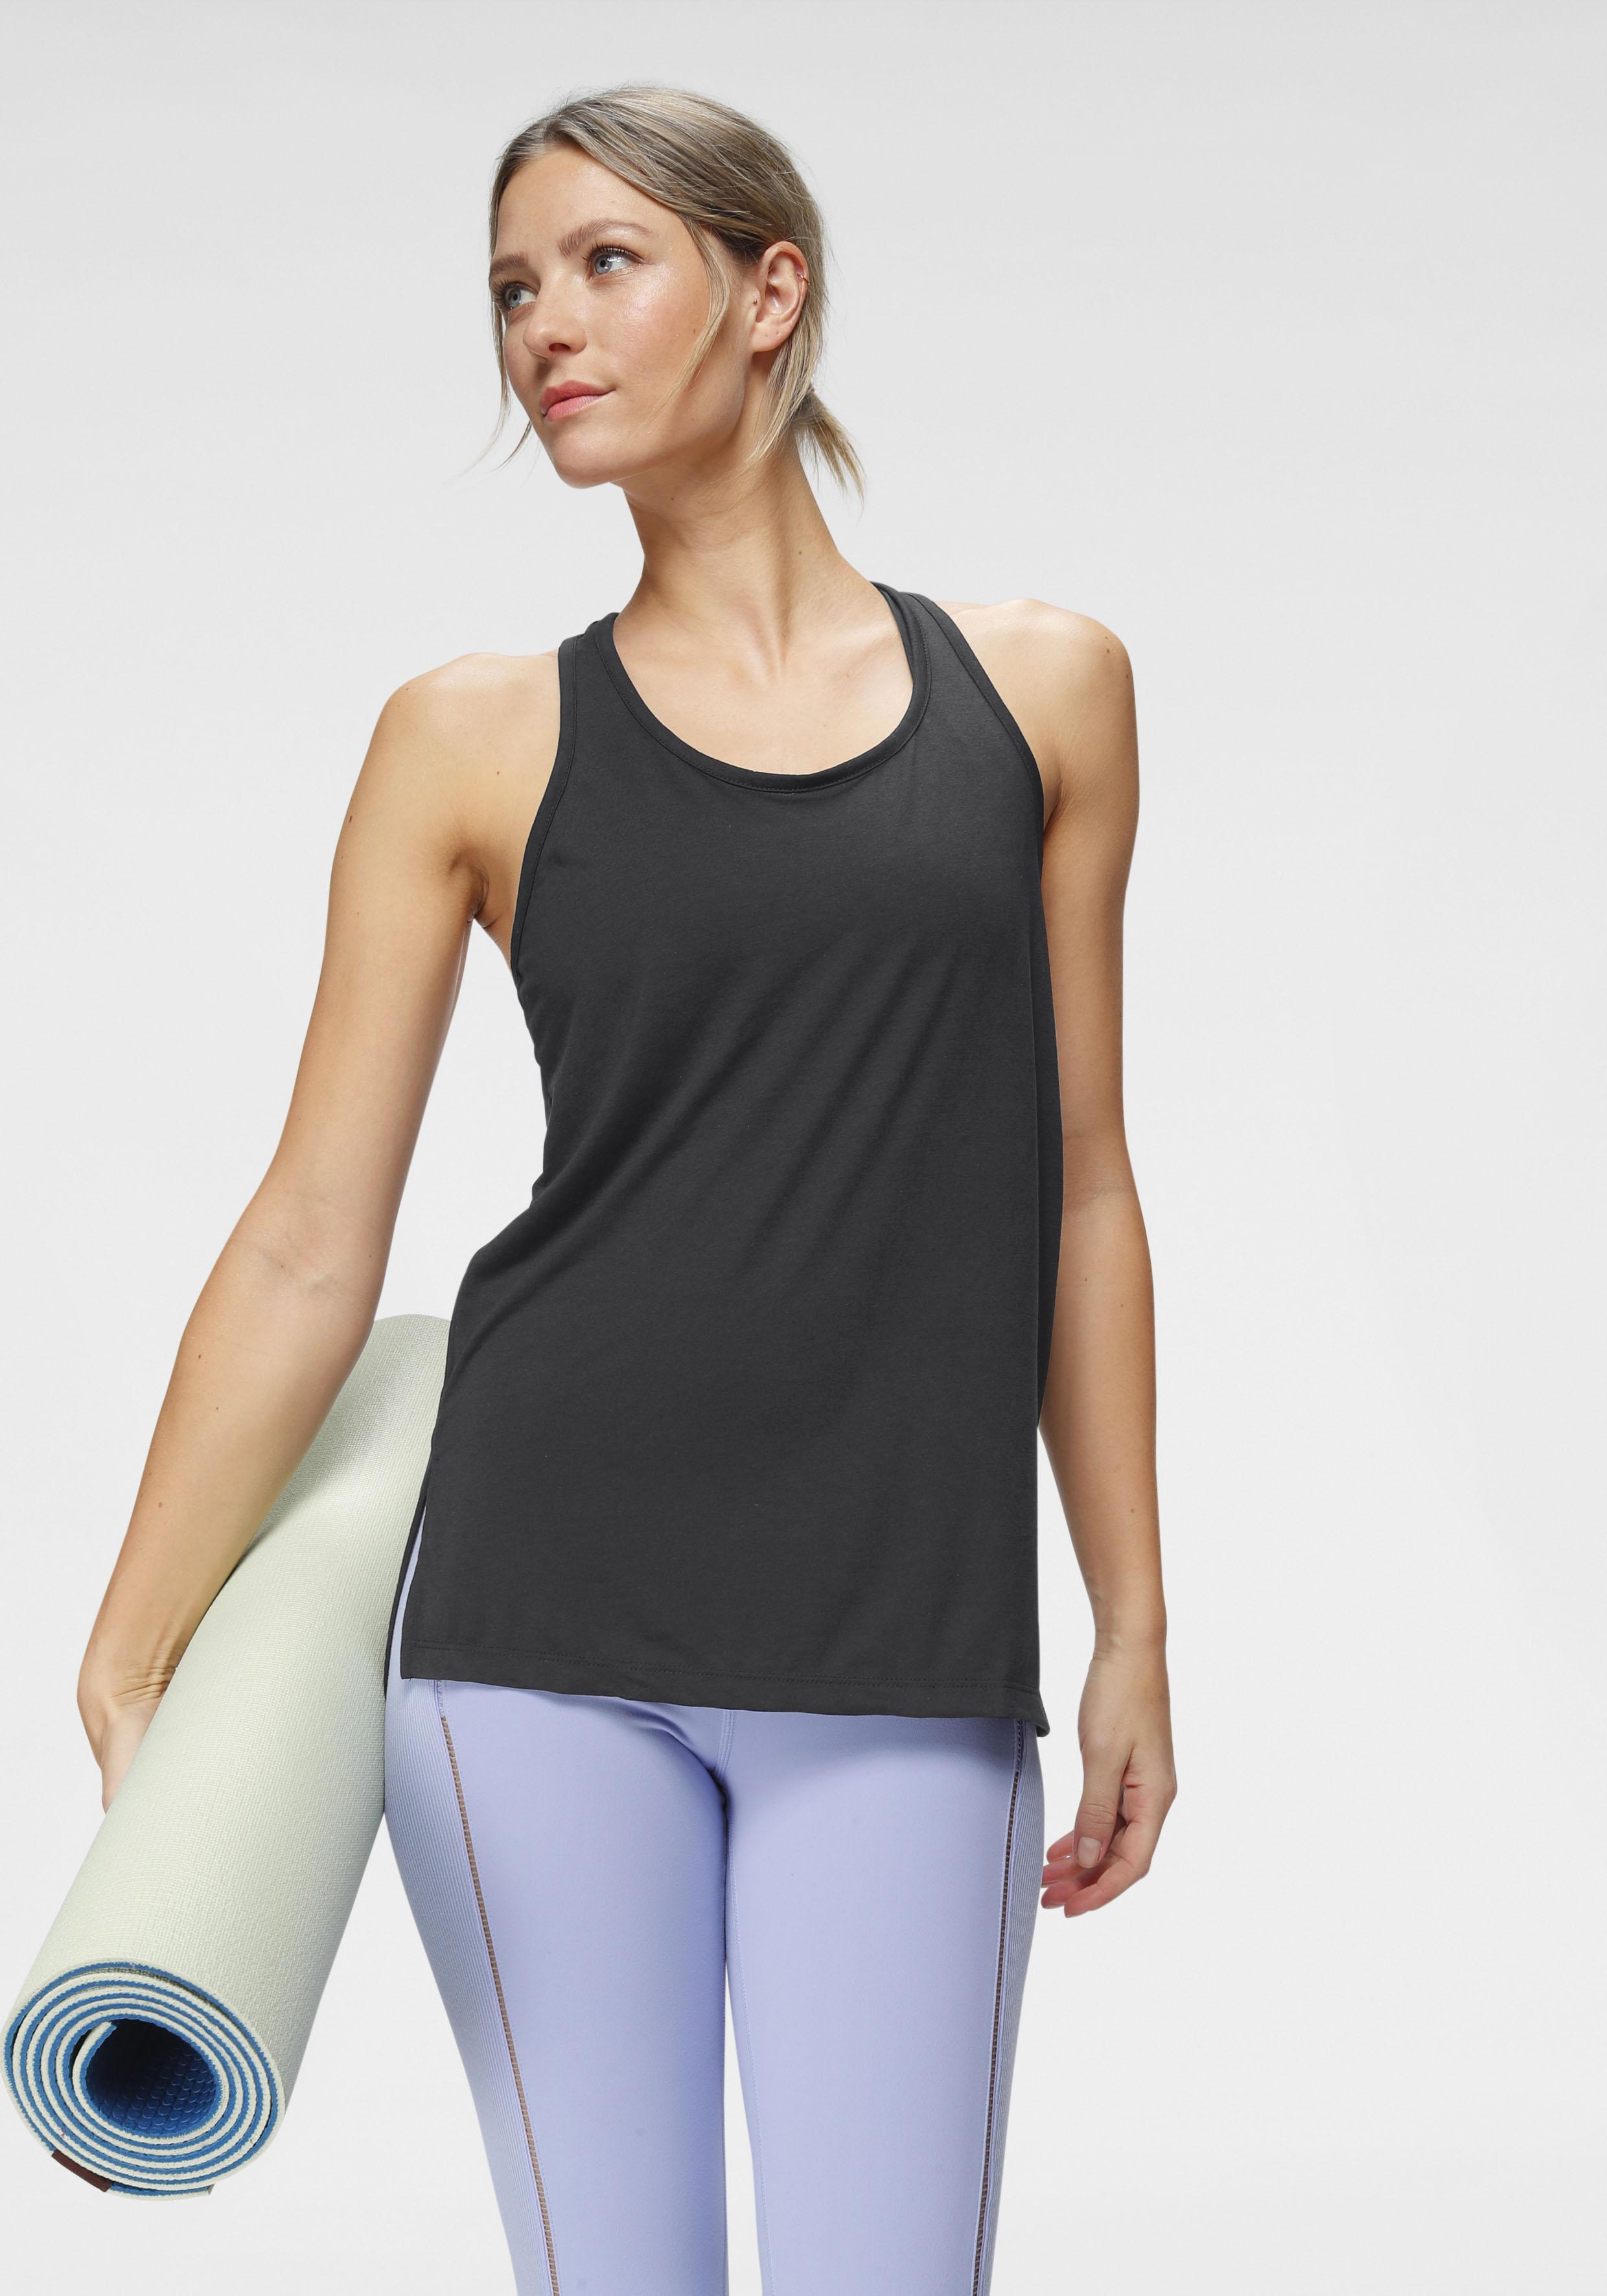 Nike Yogatop Nike Yoga Women's Tank, schwarz, Damen